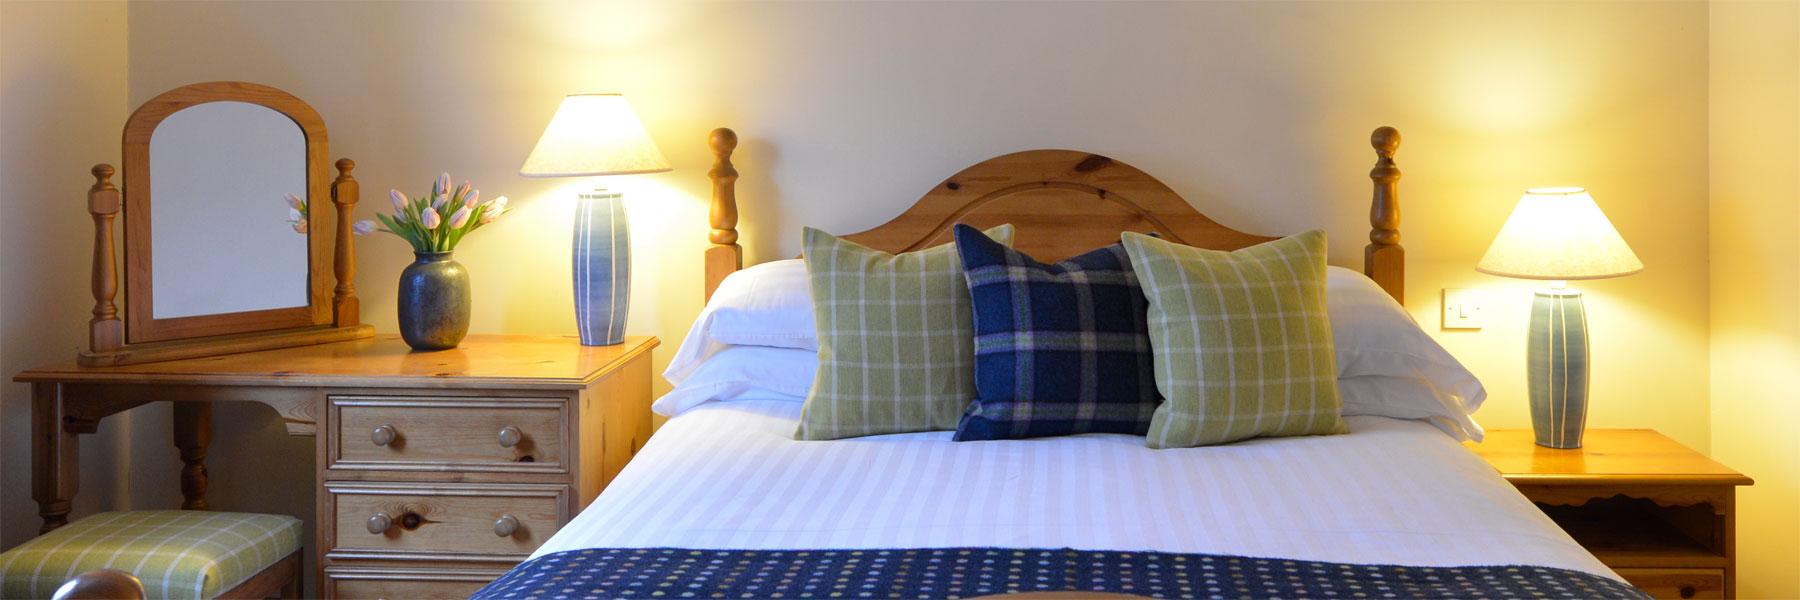 Drumcroy Lodges Aberfeldy - Bedroom 1